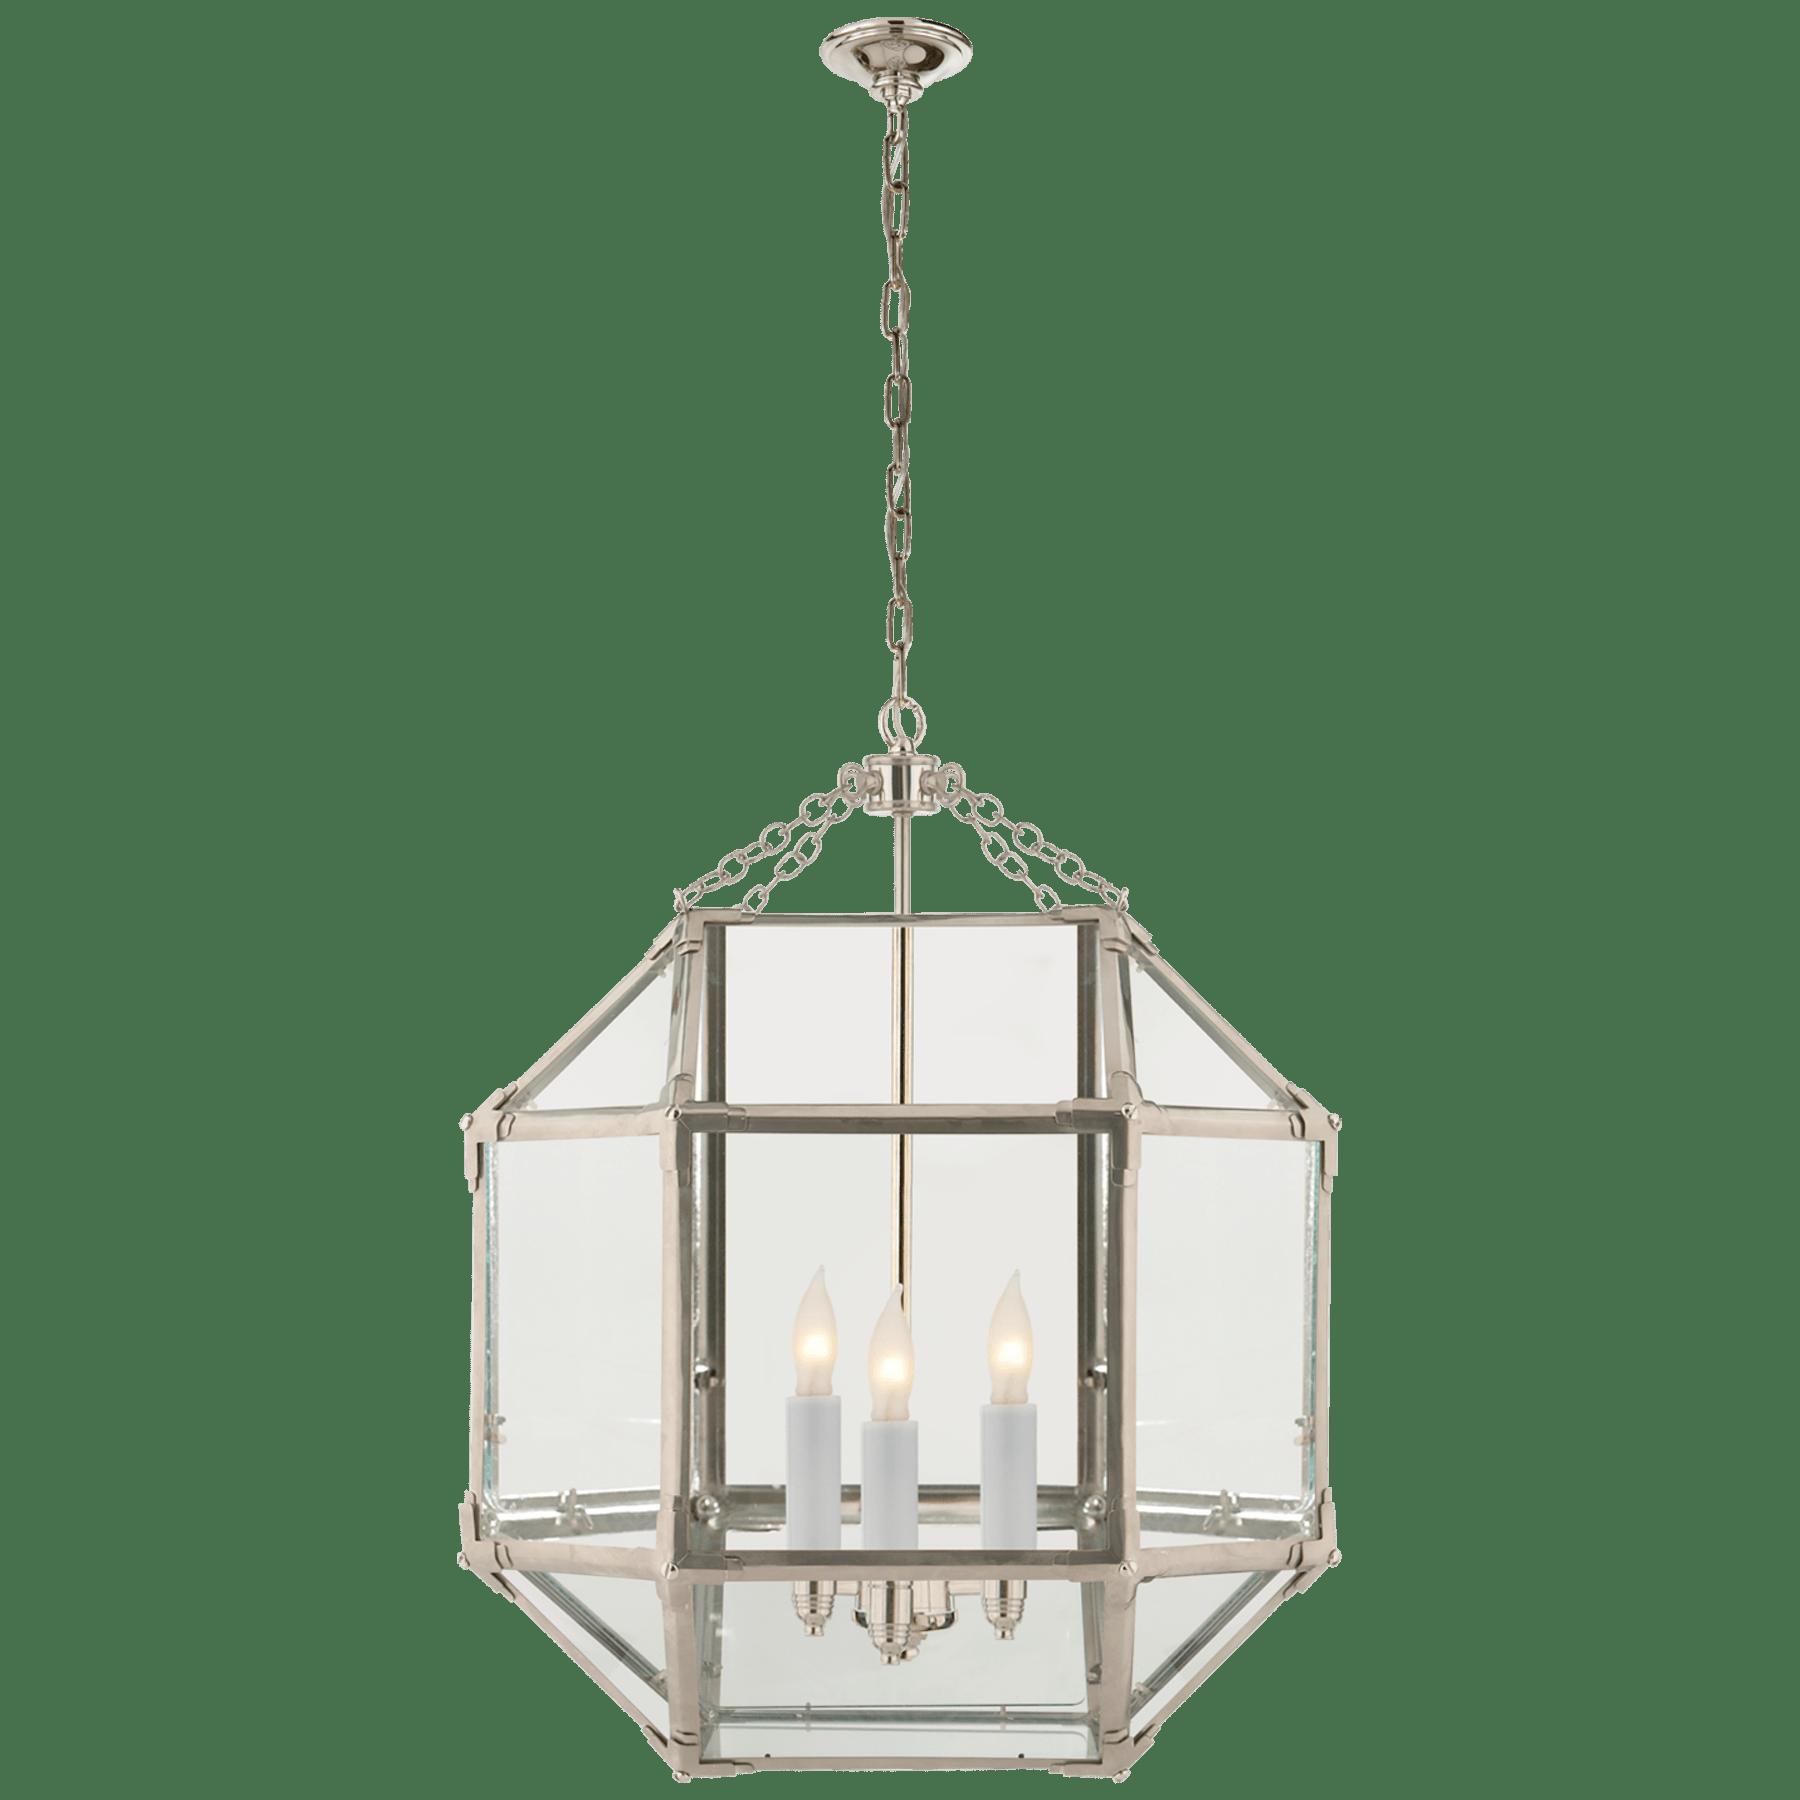 Morris Medium Lantern Circa Lighting